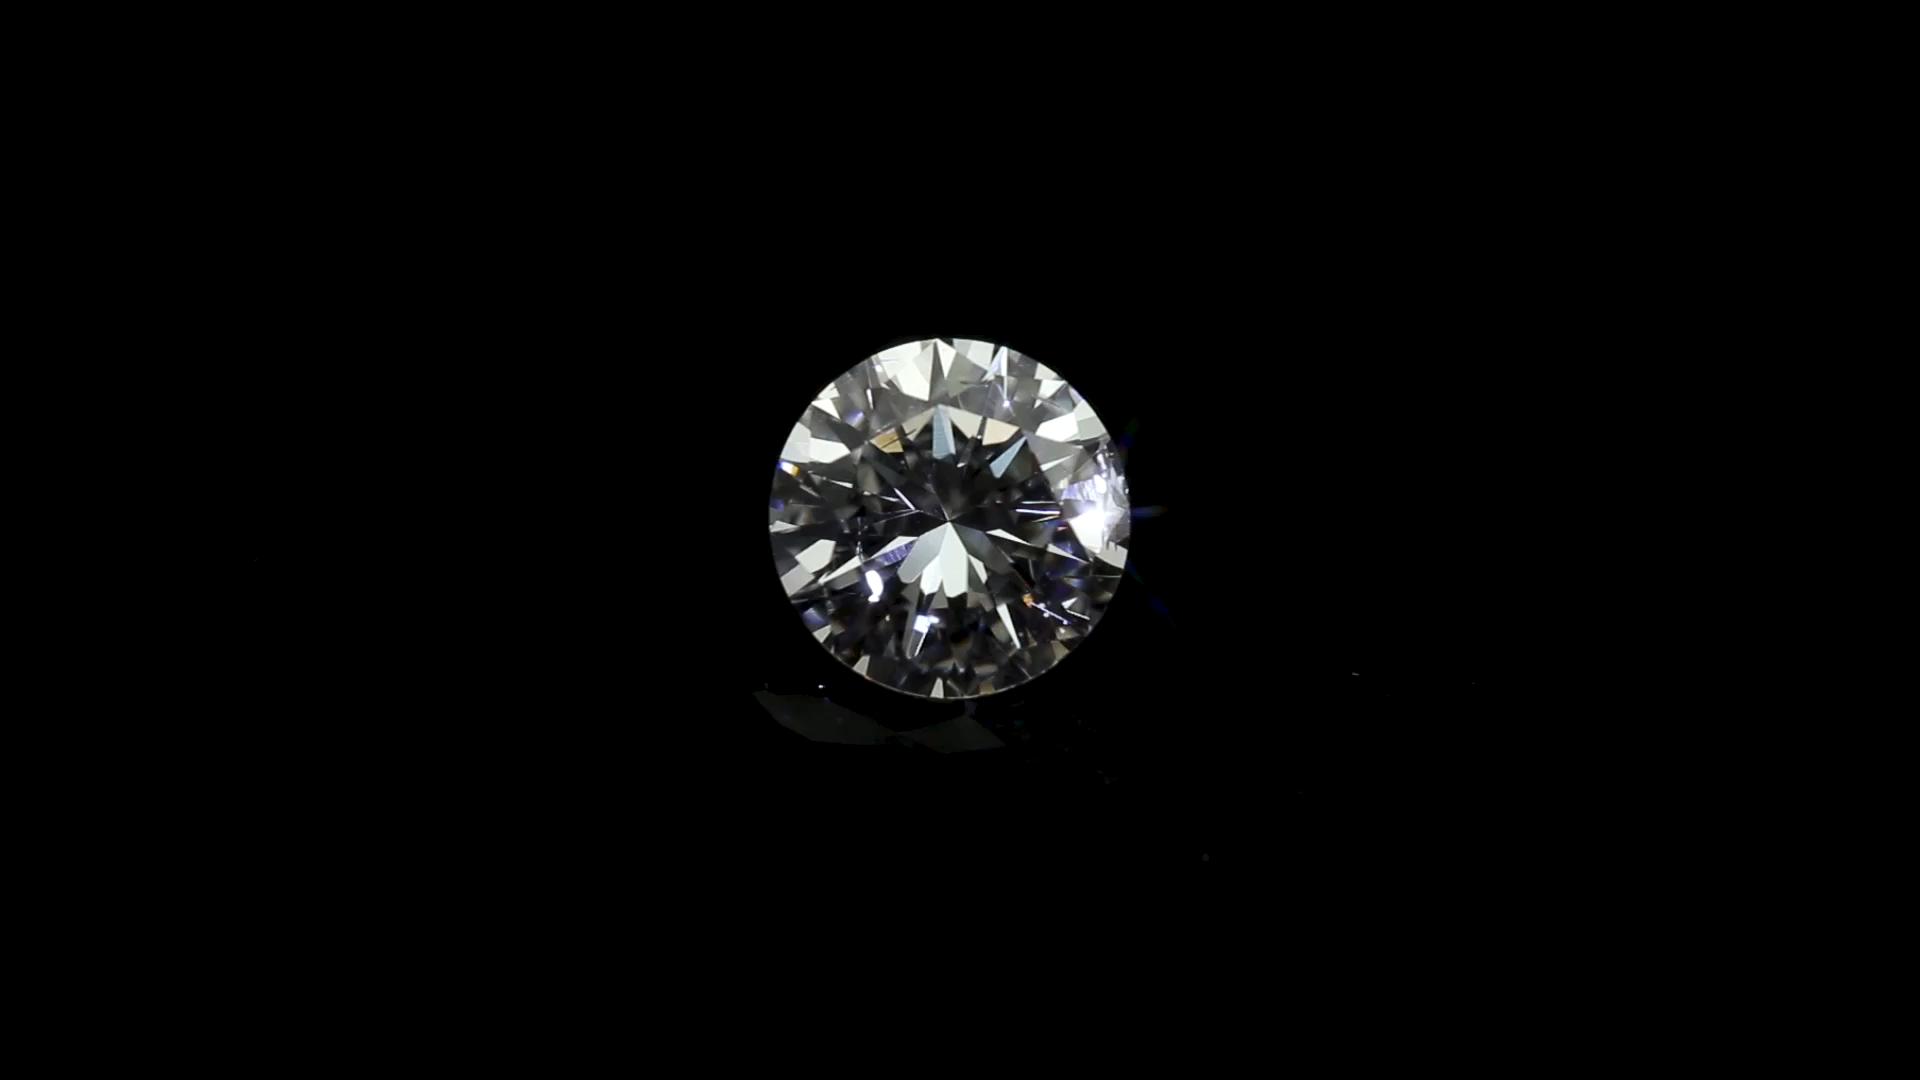 Loose 1.39carat D VS2 3EX good quality synthetic HPHT CVD lab grown diamond